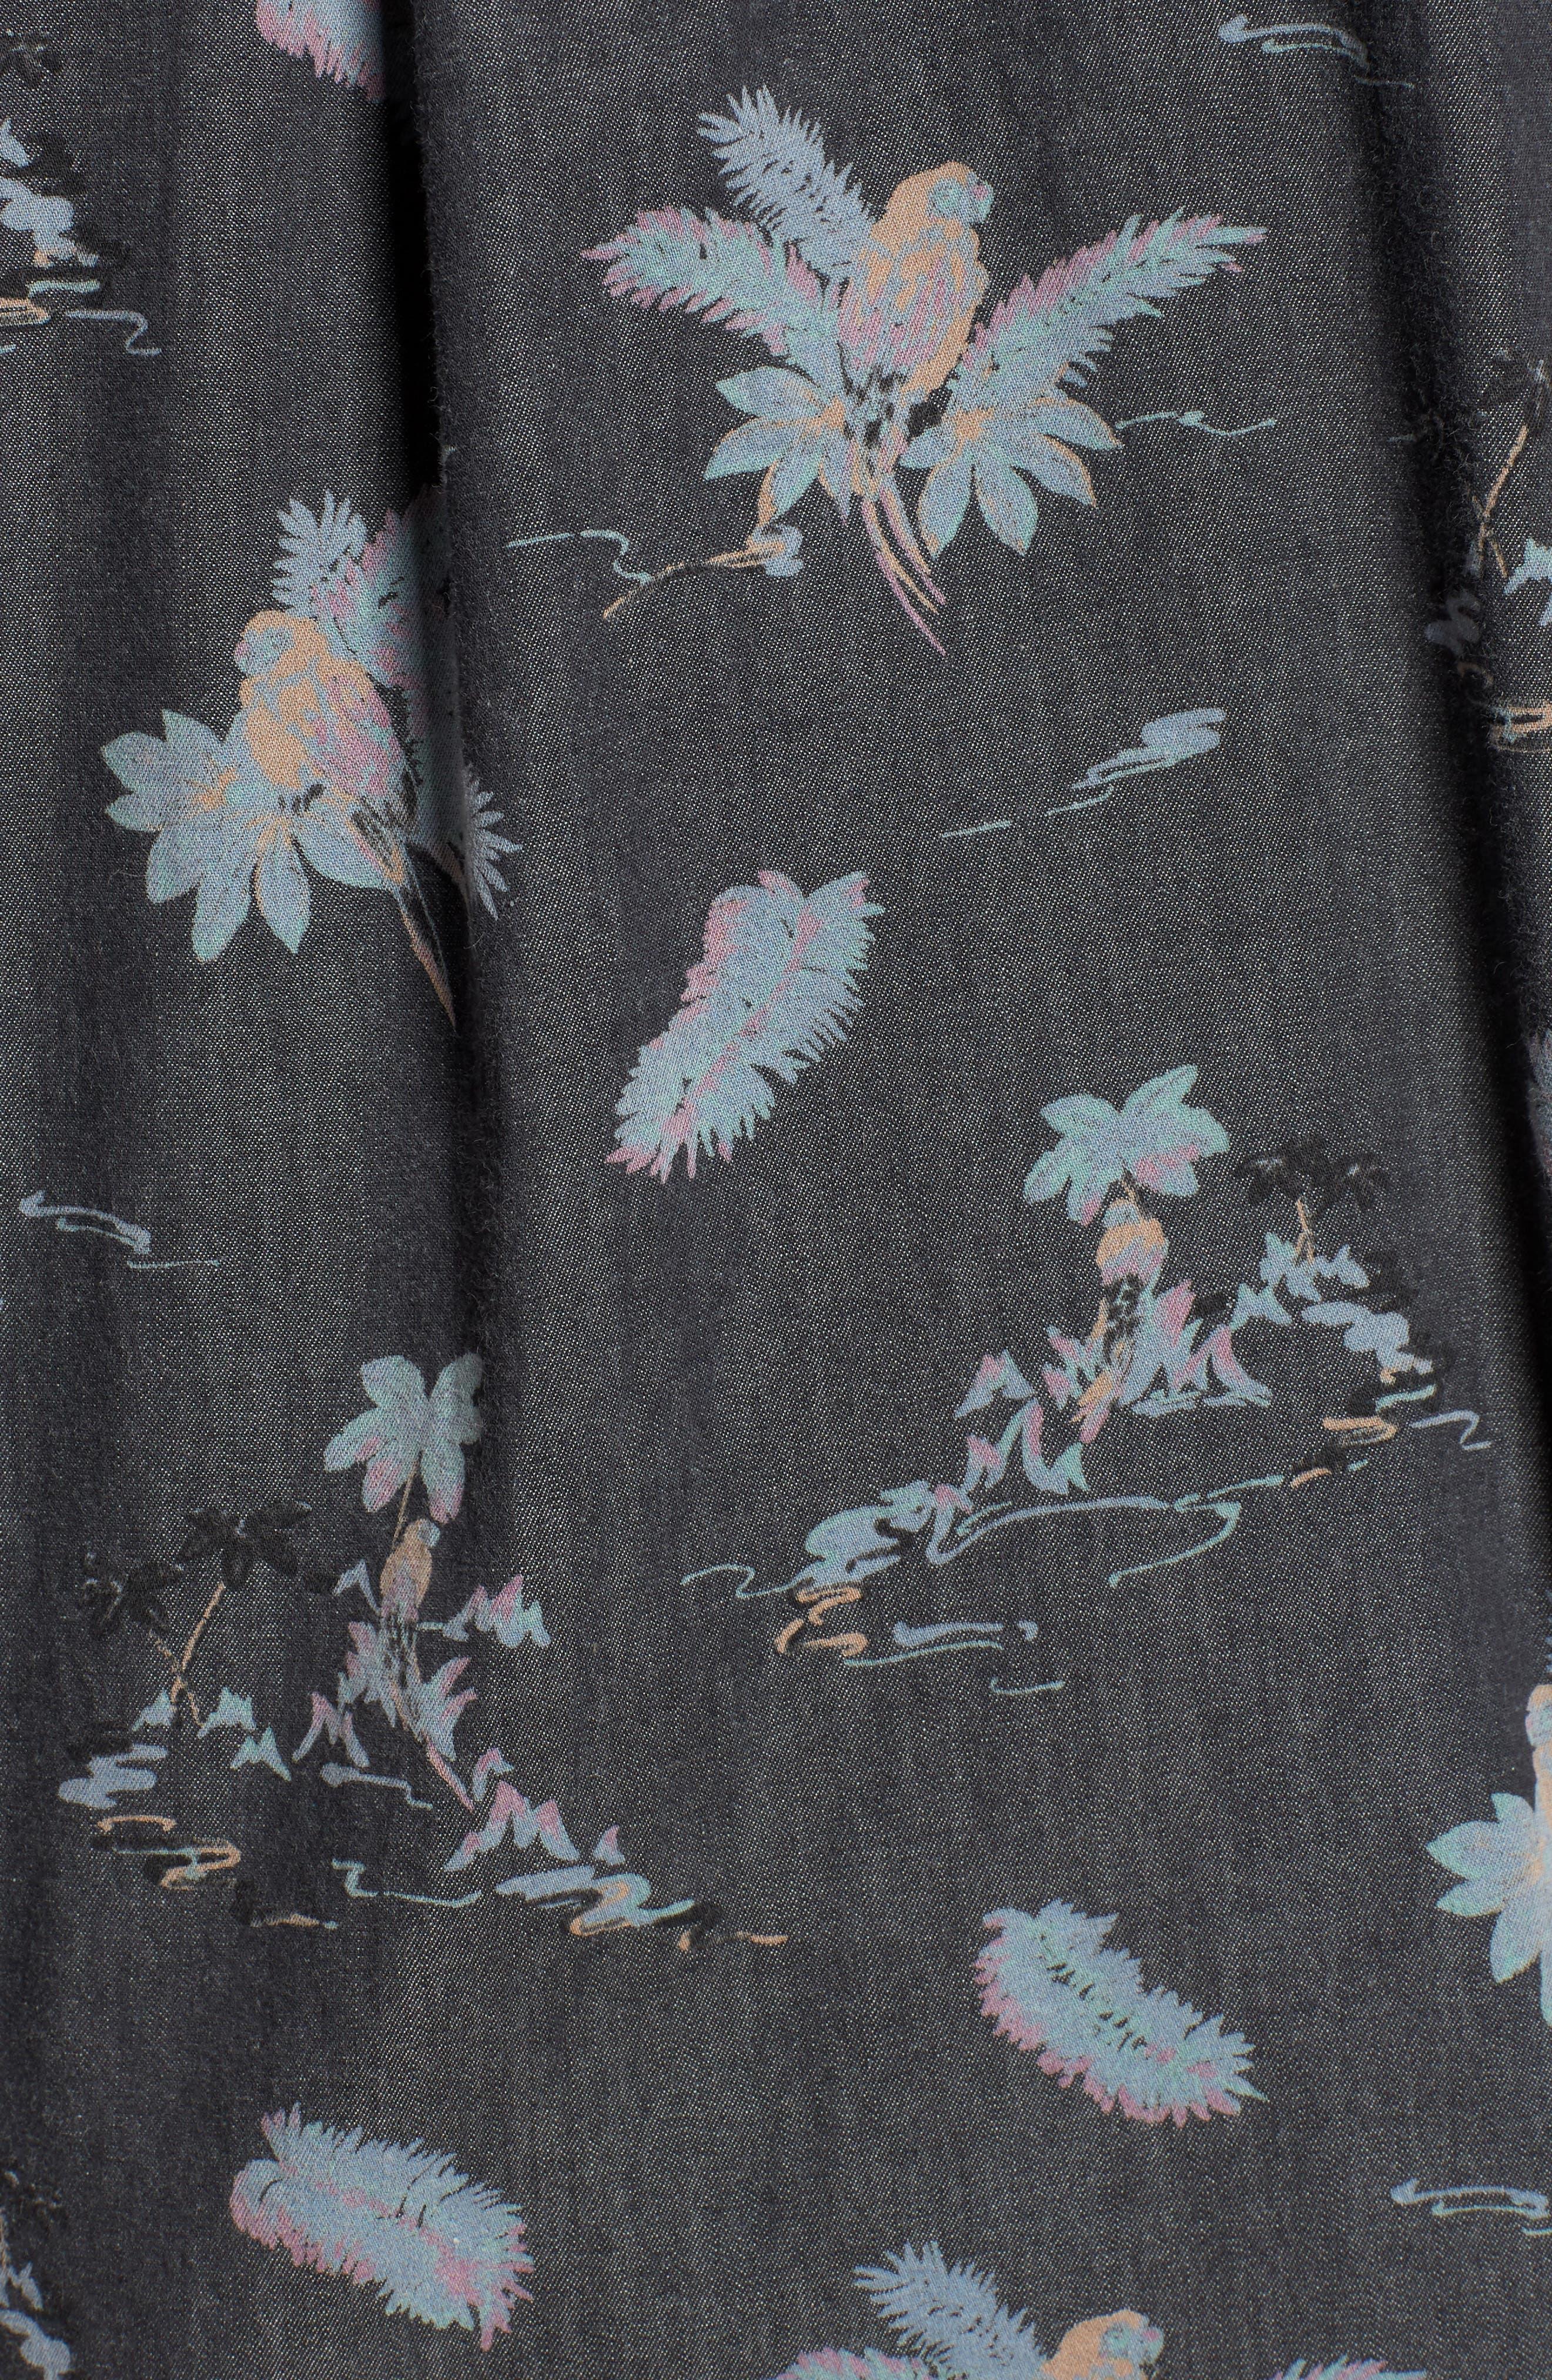 Meledrone Woven Shirt,                             Alternate thumbnail 9, color,